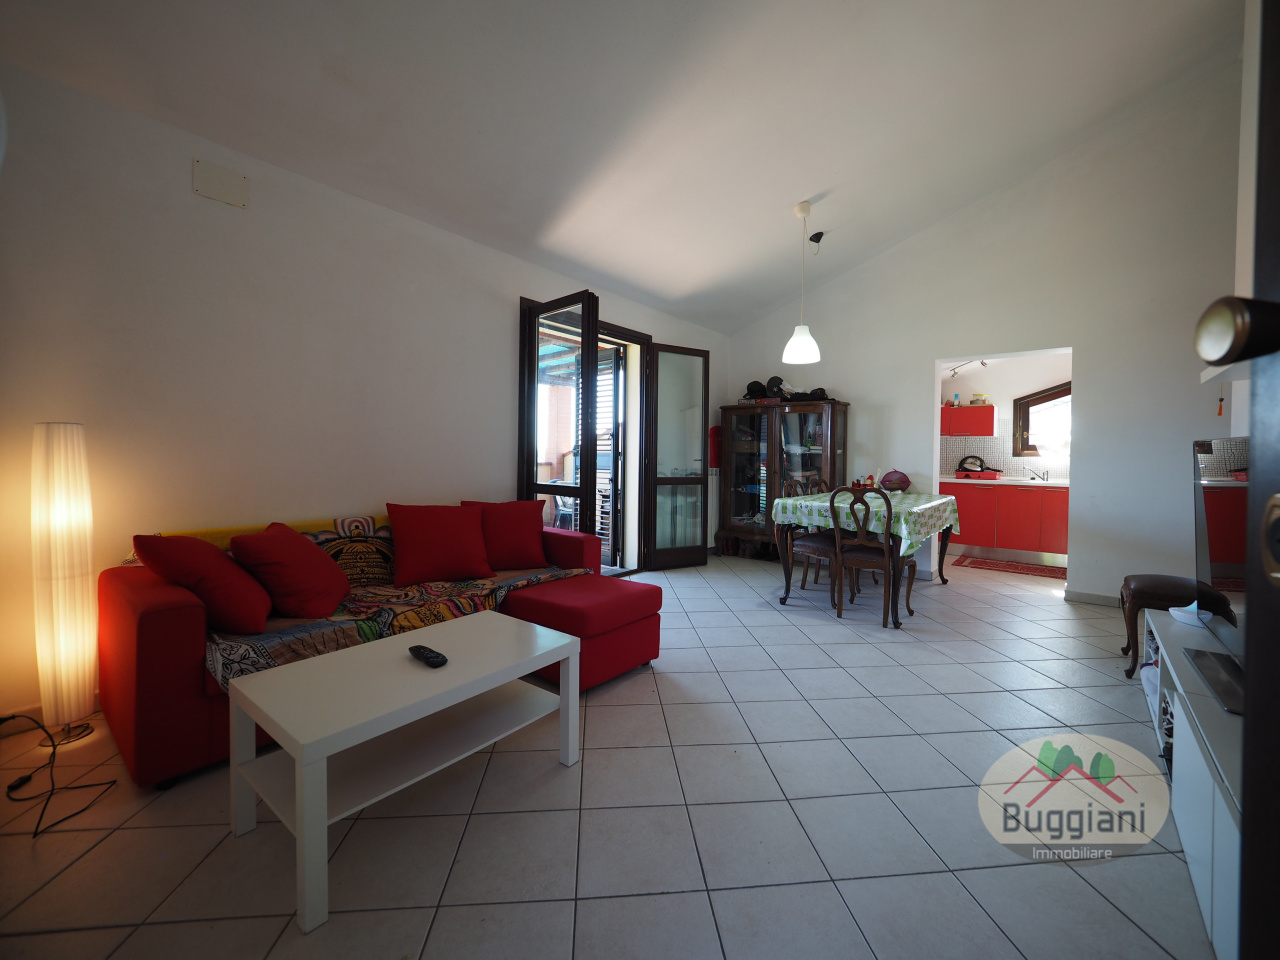 Appartamento in vendita RIF. 1795, Montopoli in Val d'Arno (PI)